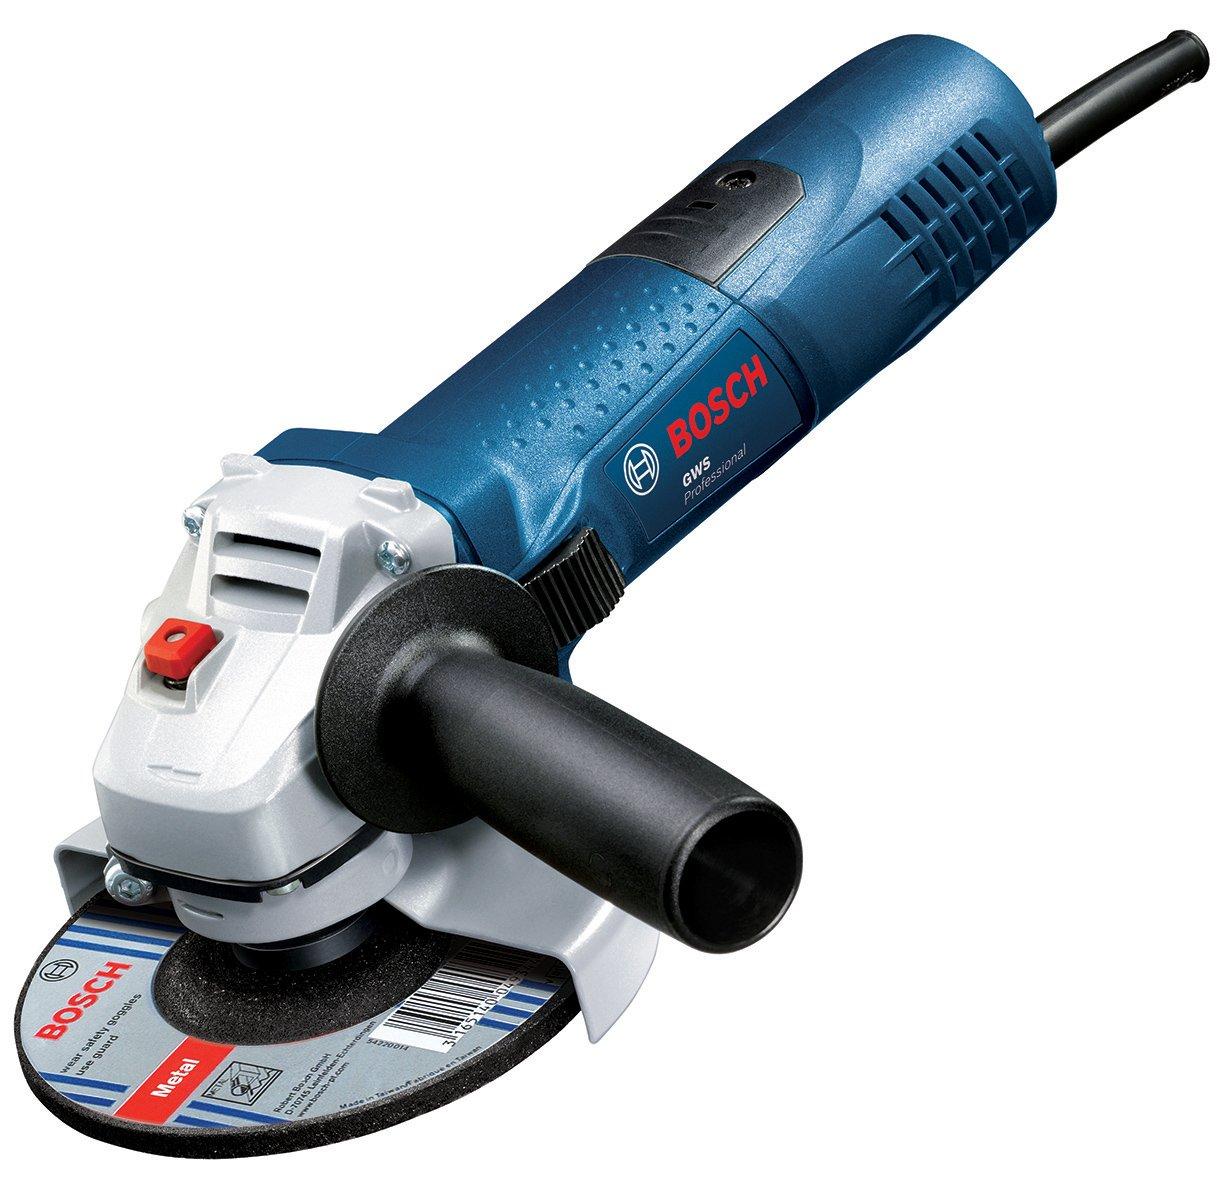 Bosch Professional GWS 7-100 Corded 240 V Angle Grinder 0601388173